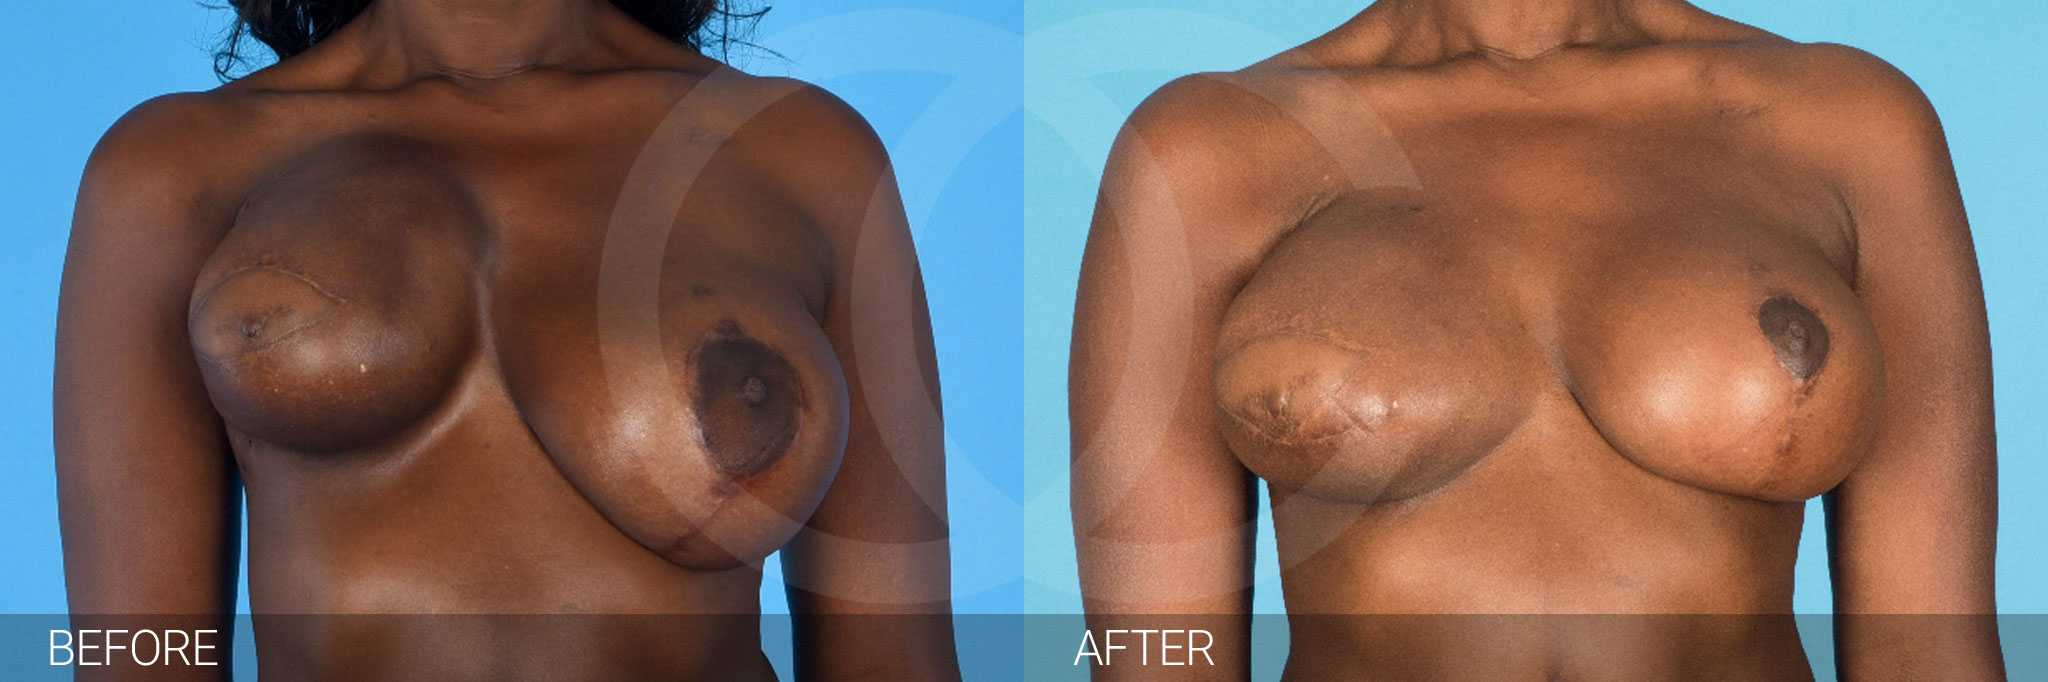 Breast Reconstruction Reconstructive Breast Surgery ante/post-op I